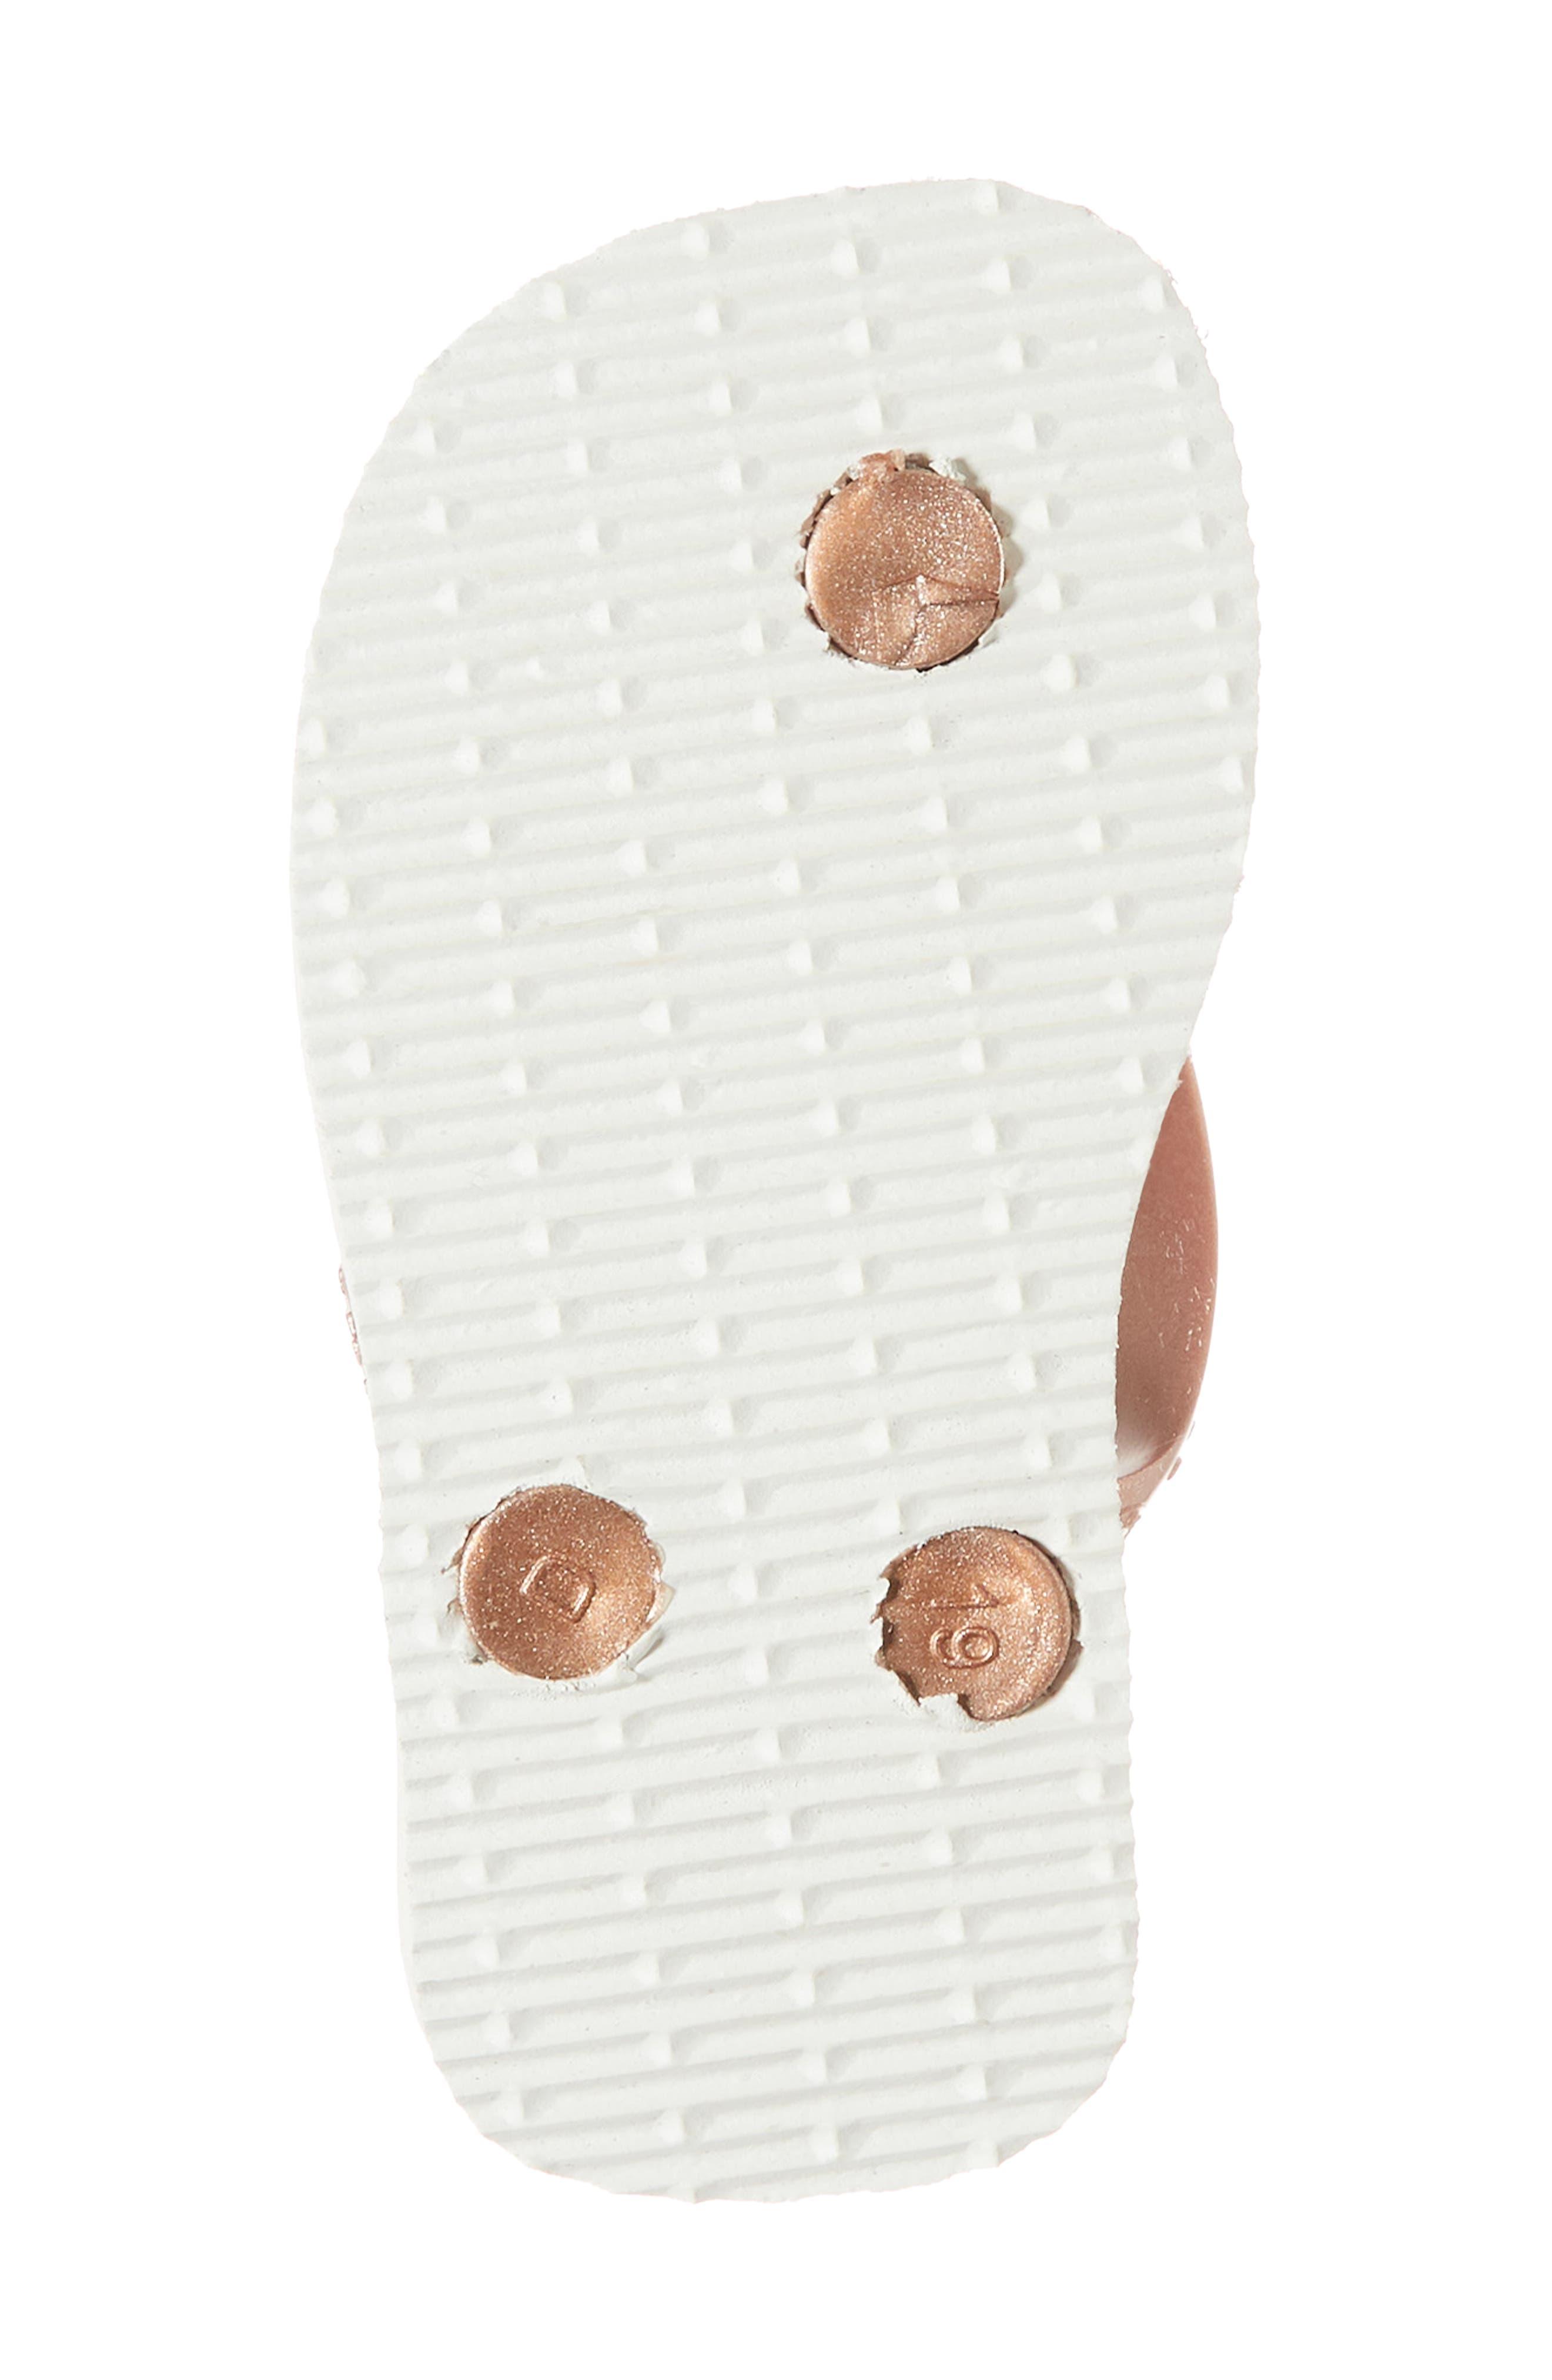 Baby Chic Metallic Flip Flop,                             Alternate thumbnail 6, color,                             White/ Golden Blush